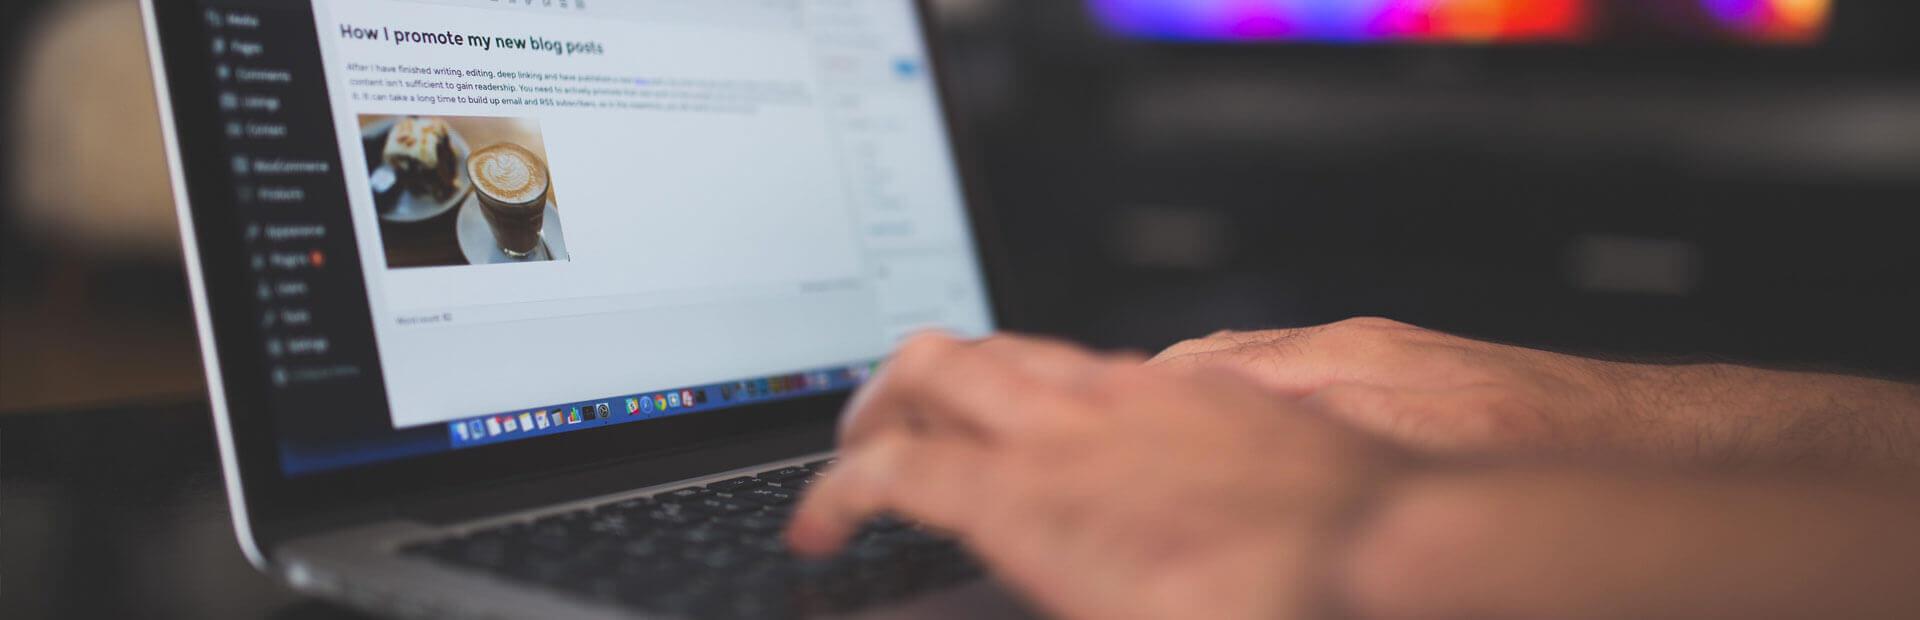 Increasing Website Traffic By Updating Old Blog Posts - Inbound Rocket